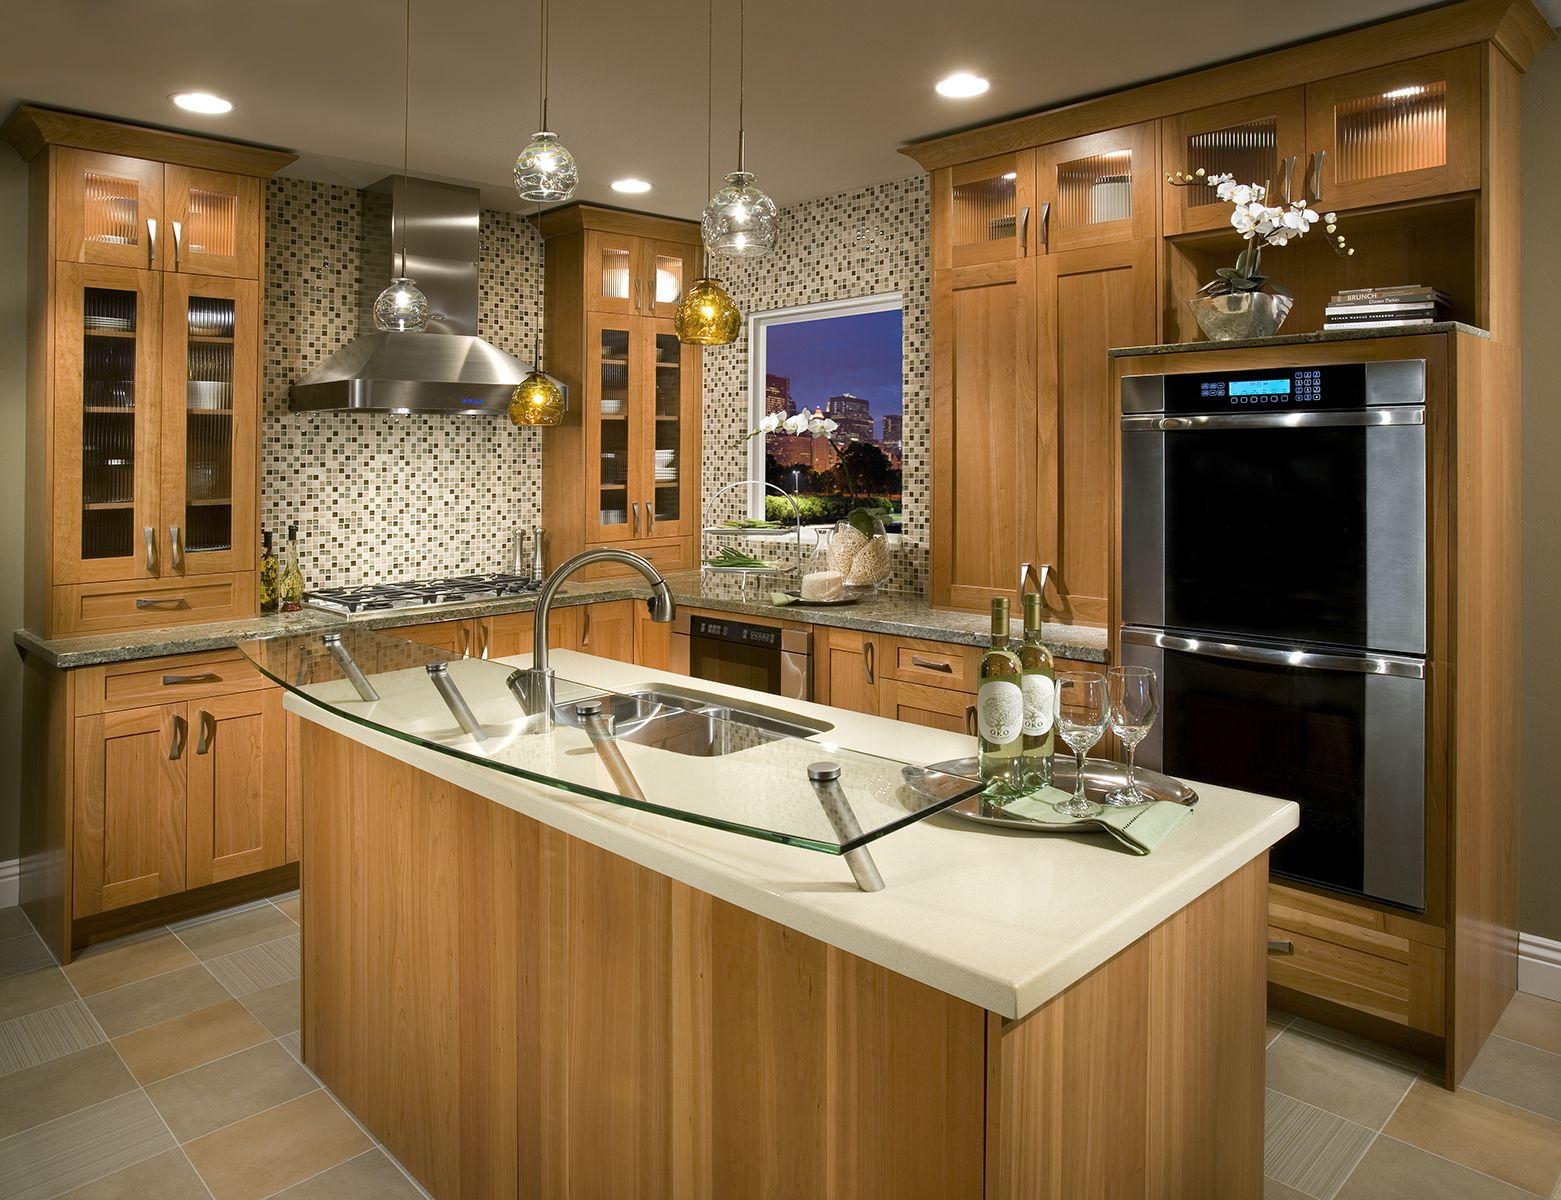 Clean Lines Gorgeous Kitchen Kitchen Remodel Kitchen Remodel Design Kitchen Remodel Pictures